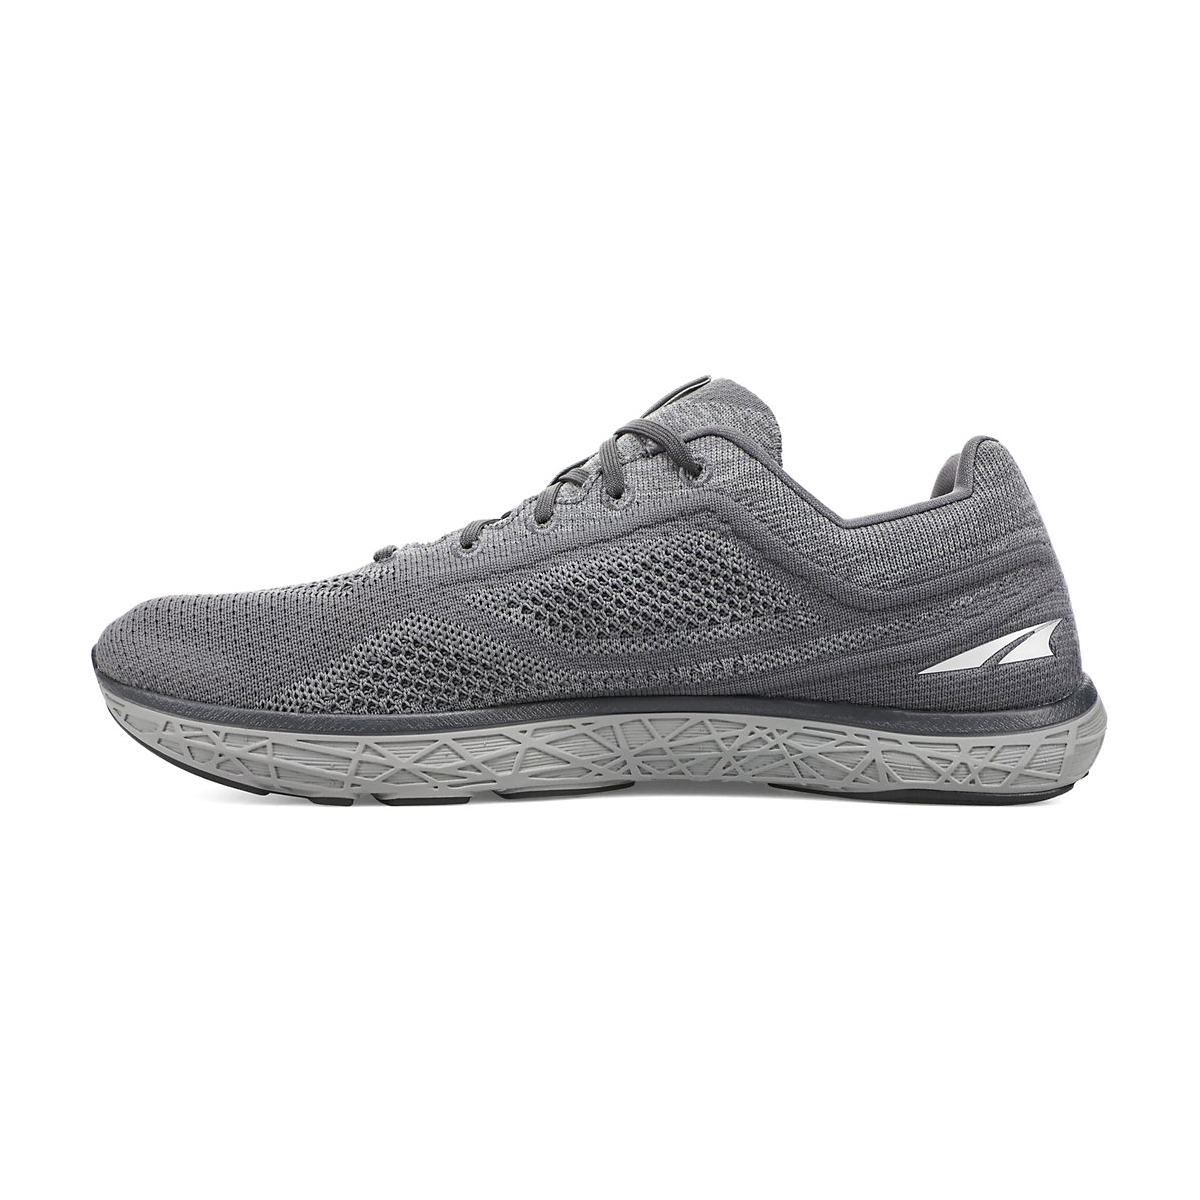 Men's Altra Escalante 2.5 Running Shoe - Color: Gray - Size: 7 - Width: Regular, Gray, large, image 2